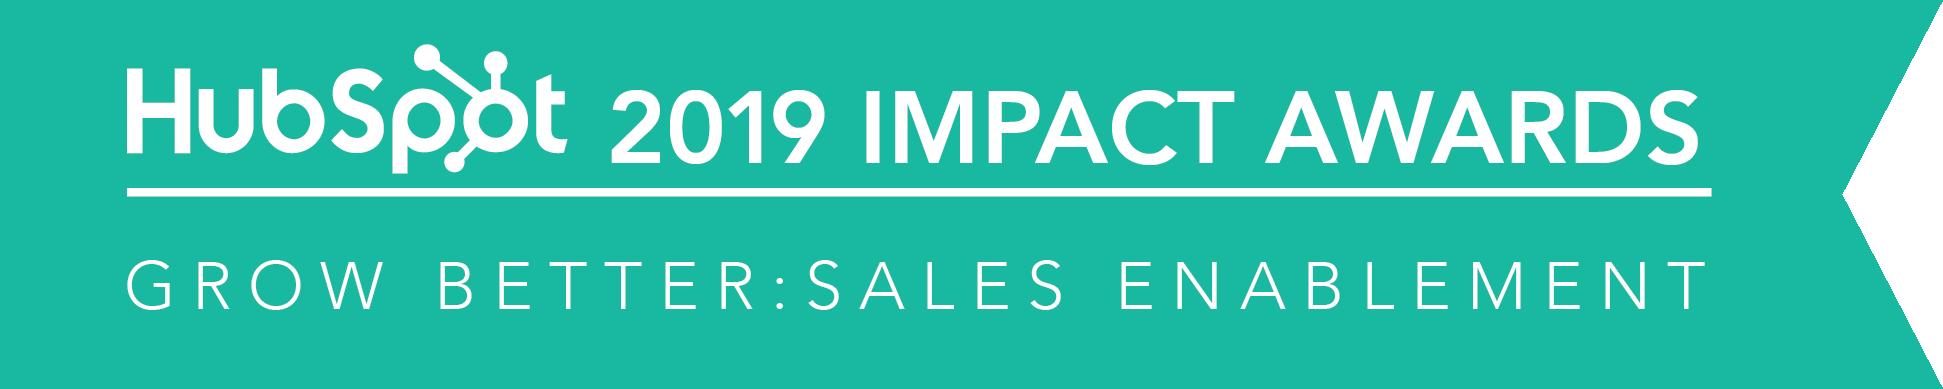 Hubspot_ImpactAwards_2019_SalesEnablement-02